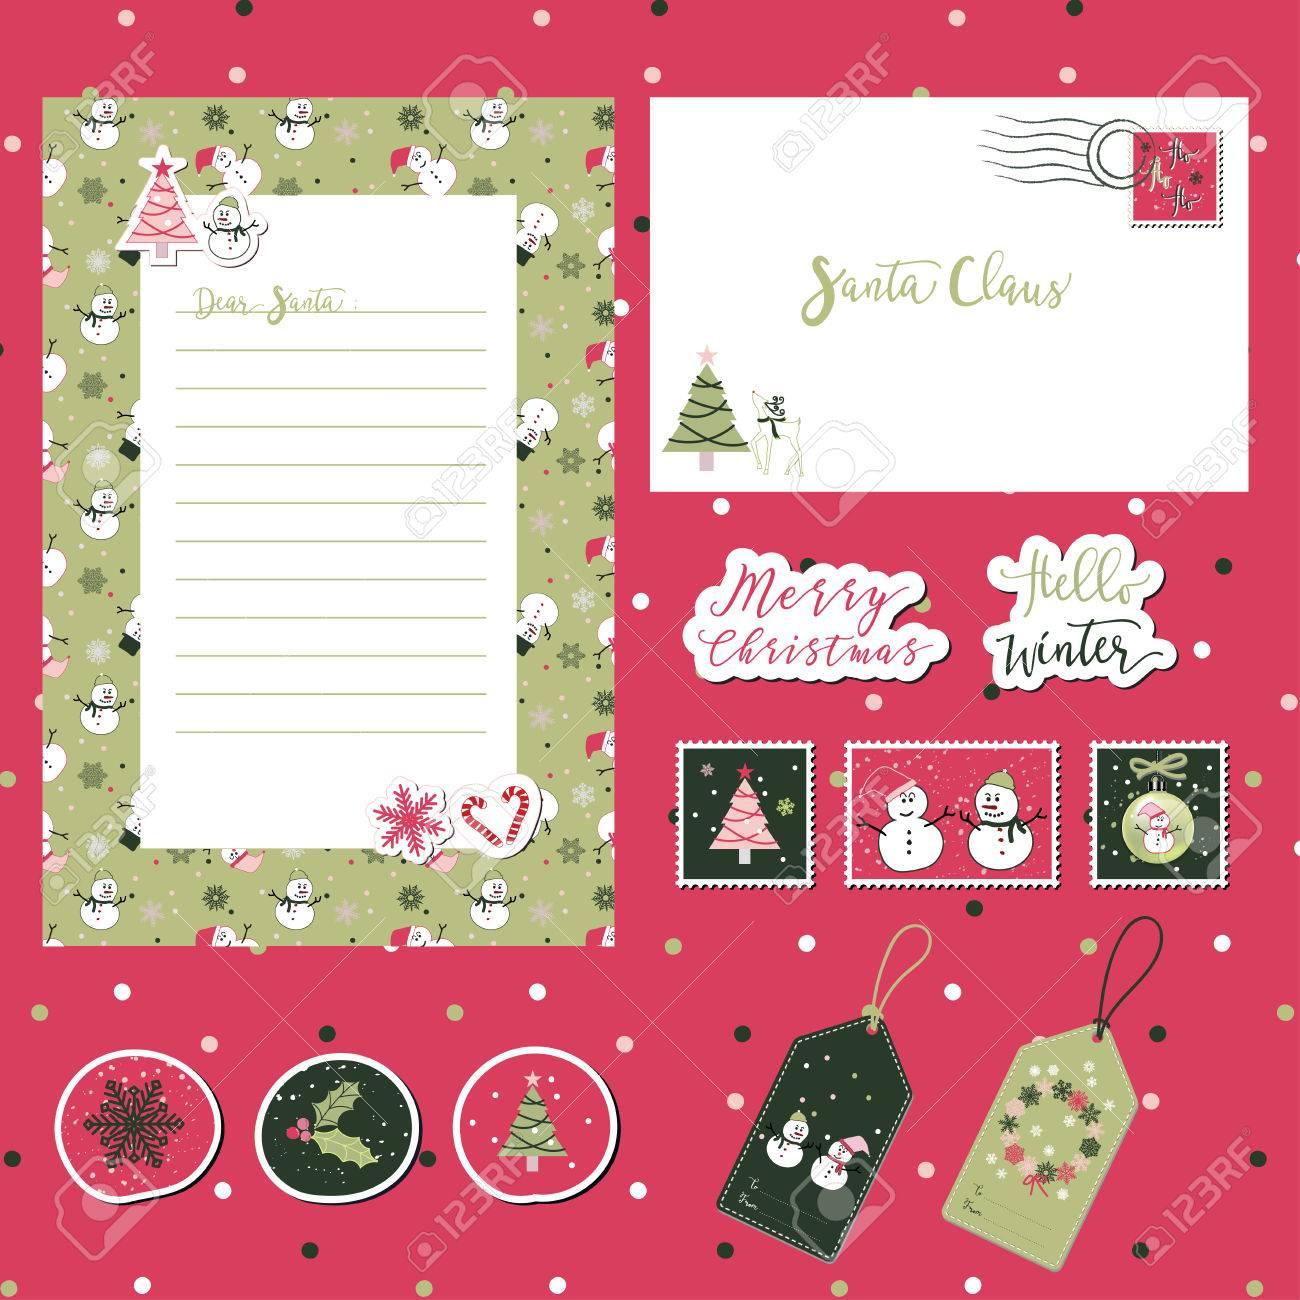 A set of merry christmas santa cute letter envelope templates a set of merry christmas santa cute letter envelope templates and stickers with text spiritdancerdesigns Gallery